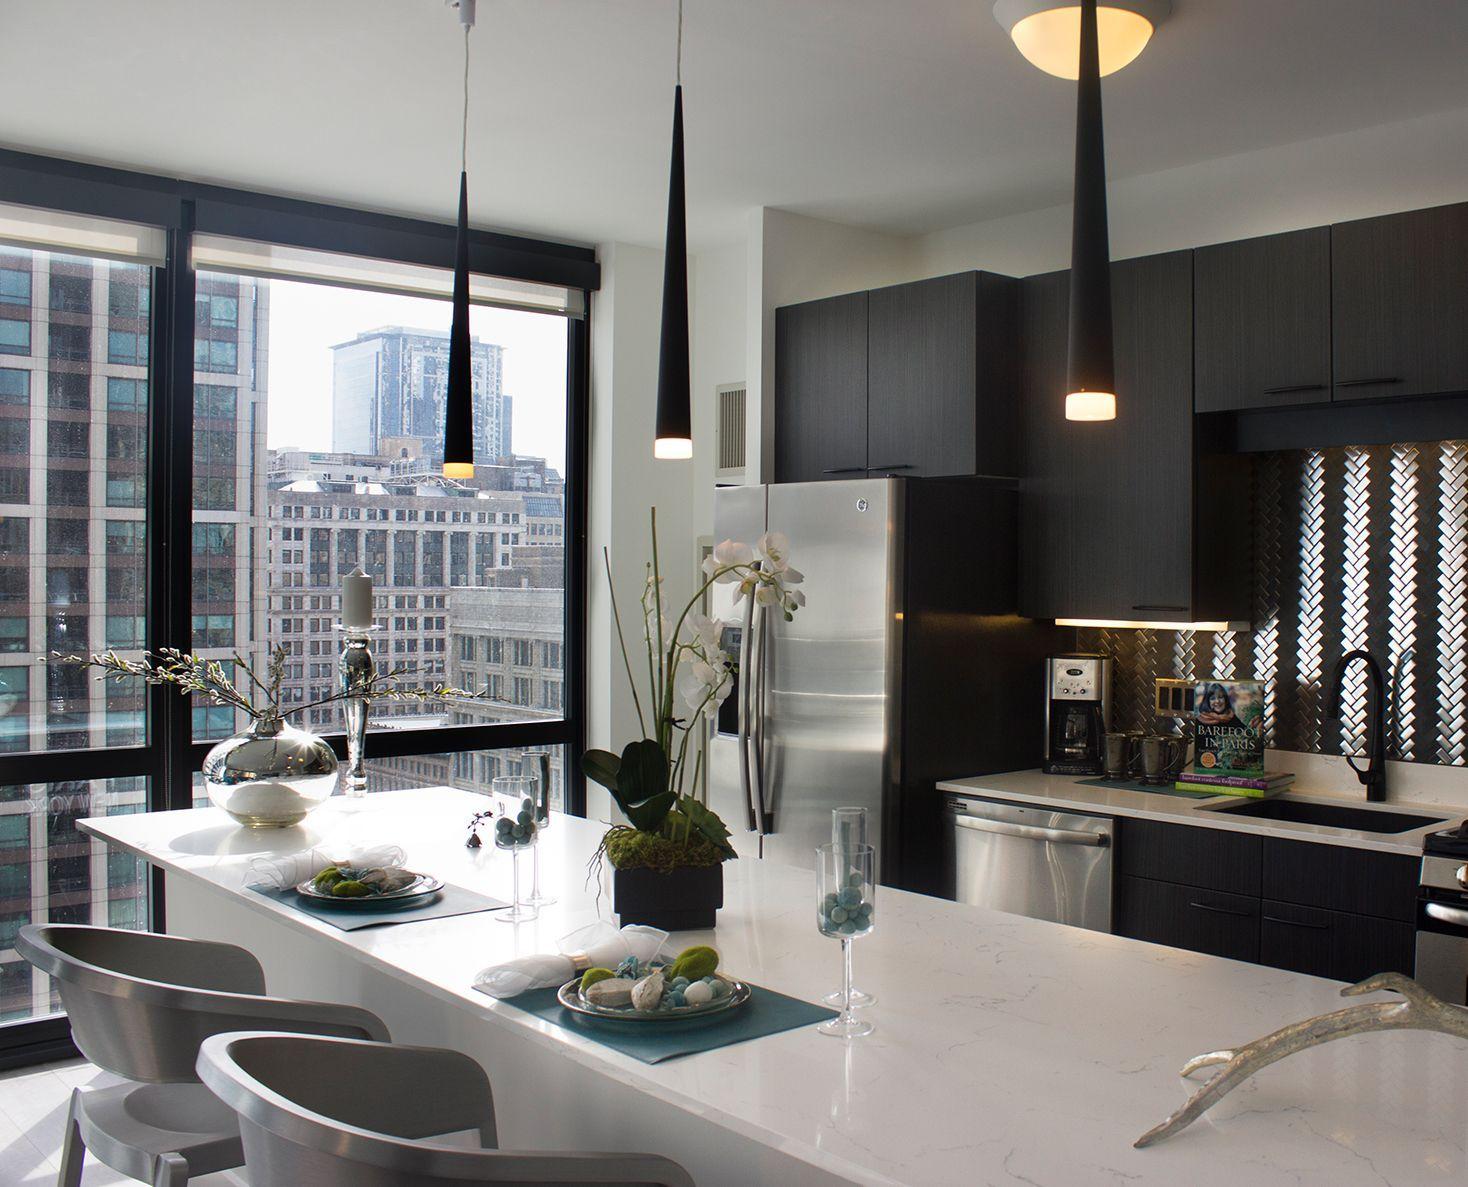 Rent A Luxury Apartment In The Chicago Loop Downtown Rental Condo Interior Condo Interior Design Luxury Apartments